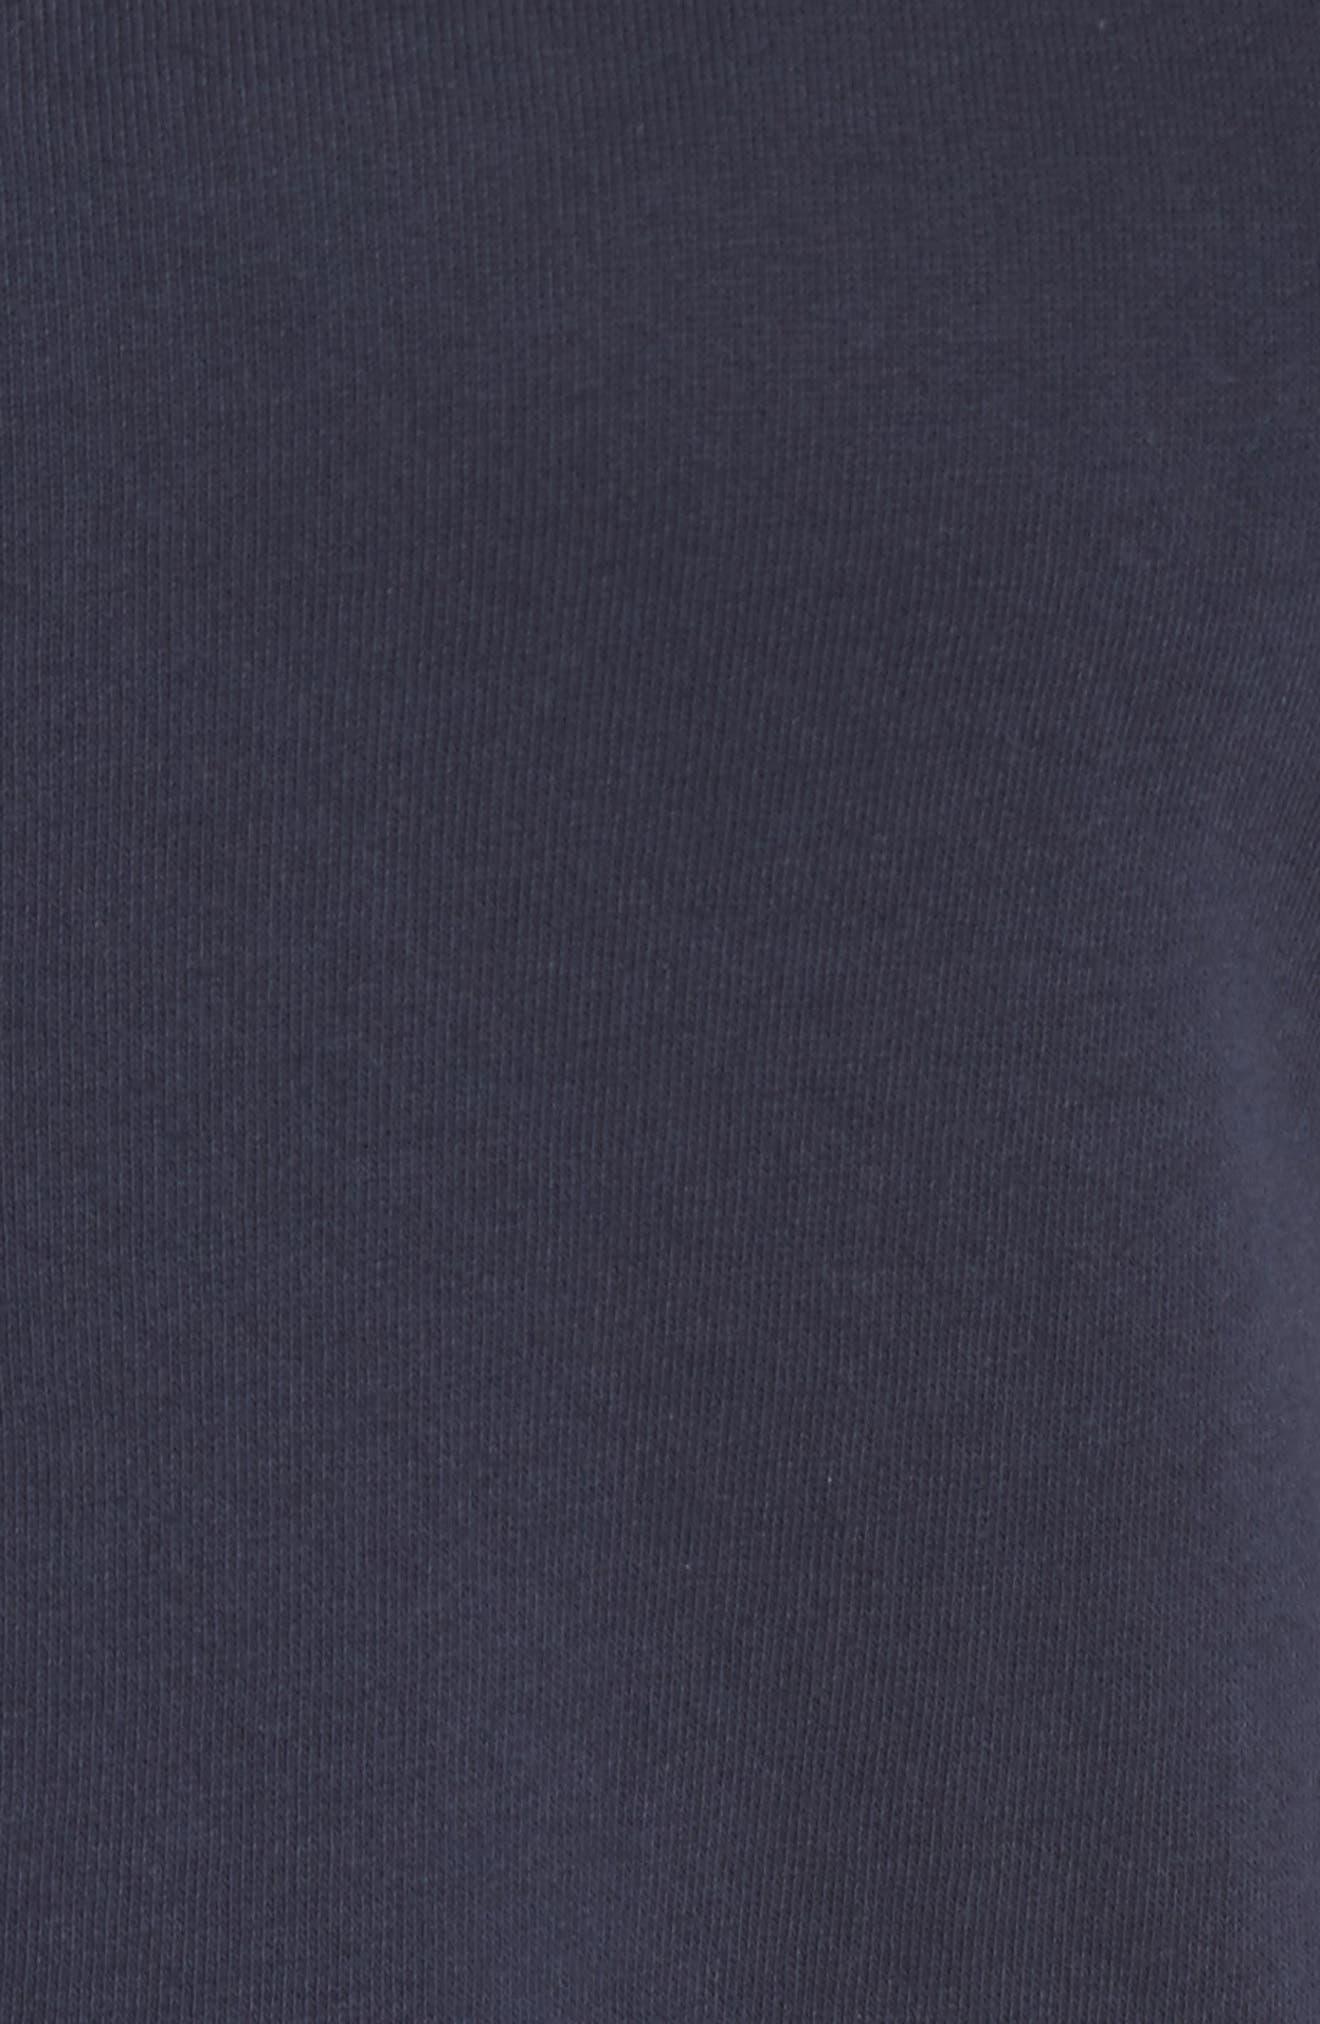 Mixed Seam Ruffle Sweatshirt,                             Alternate thumbnail 5, color,                             Navy Indigo